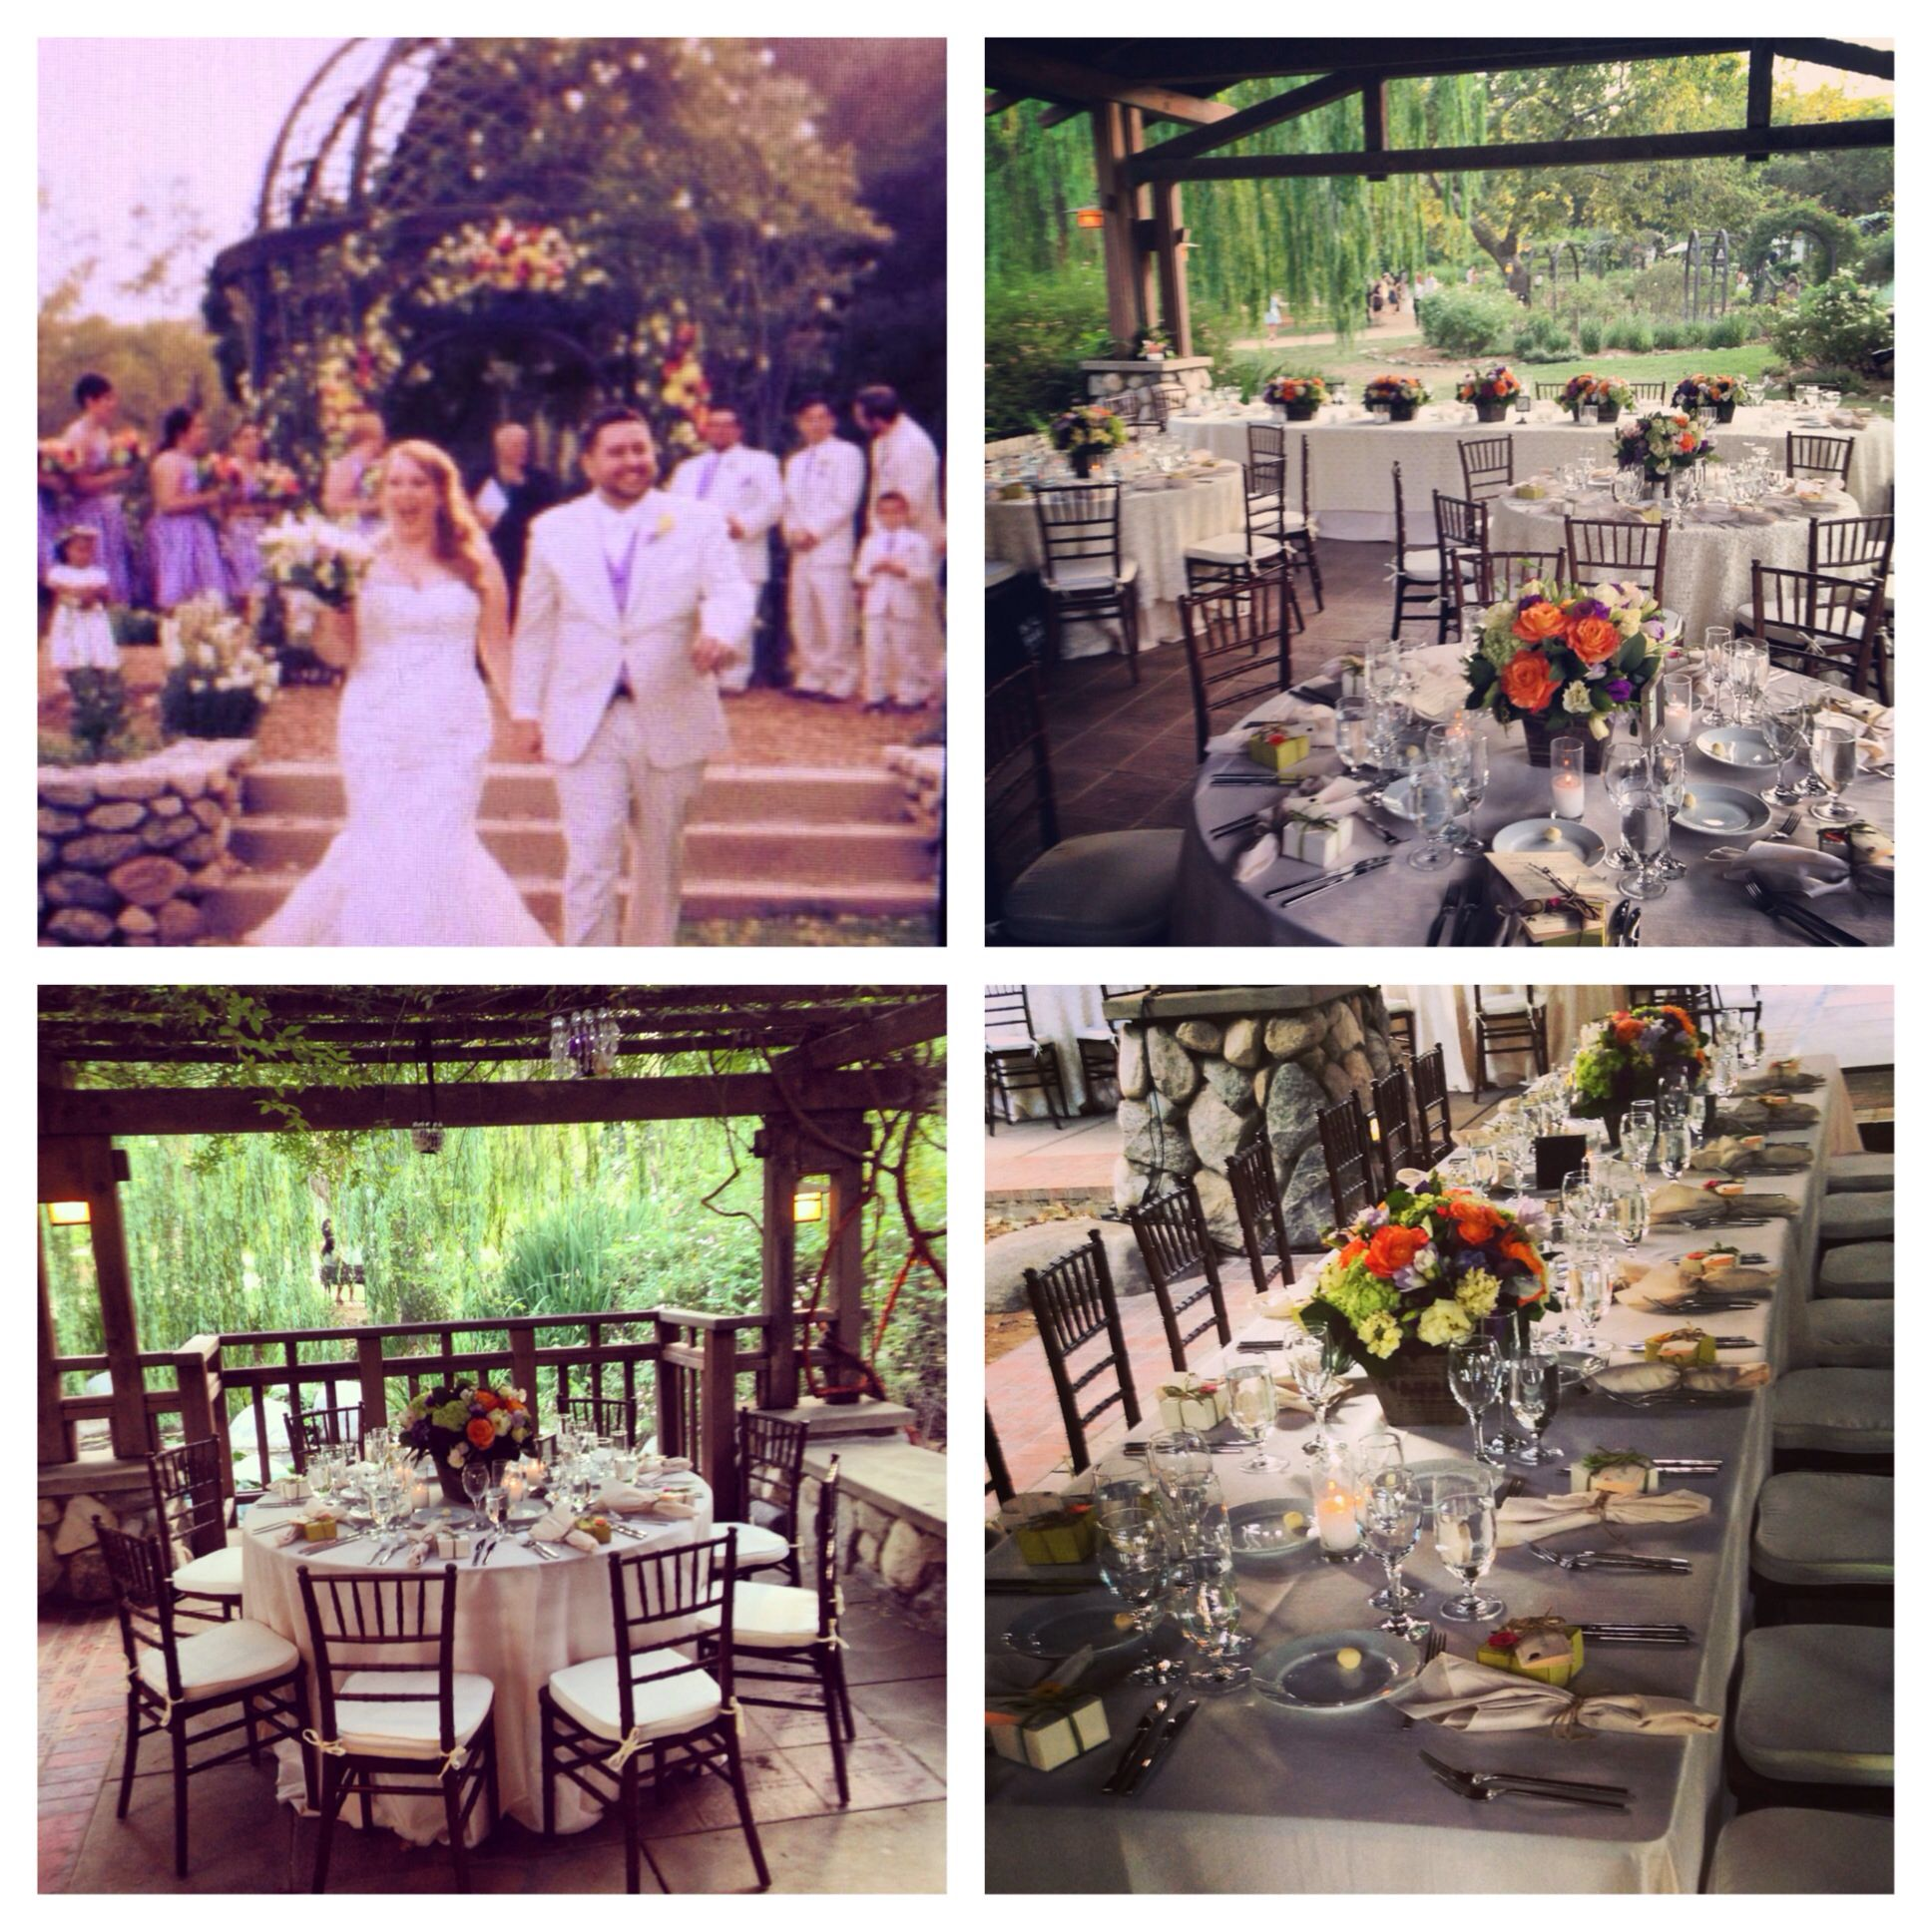 An Beautiful Garden Wedding Reception From A Wedding Planned By Celebrity Wedding Planner Kevin Garden Wedding Reception Wedding Tablescapes Celebrity Weddings